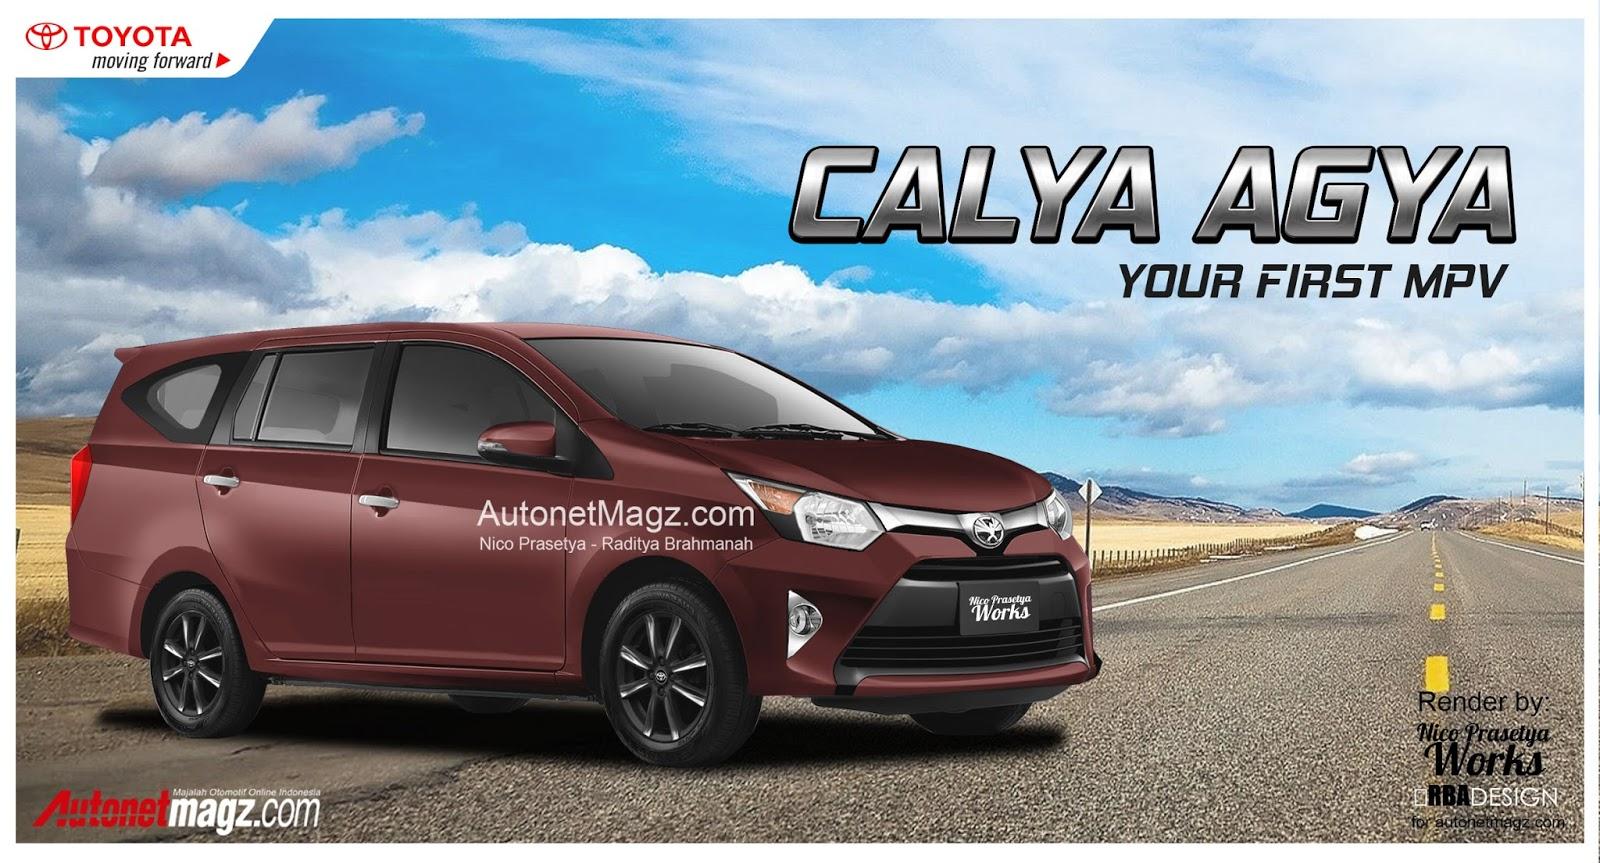 Daftar Harga Terbaru Mobil Toyota New Calya Wilayah Indramayu Jawa